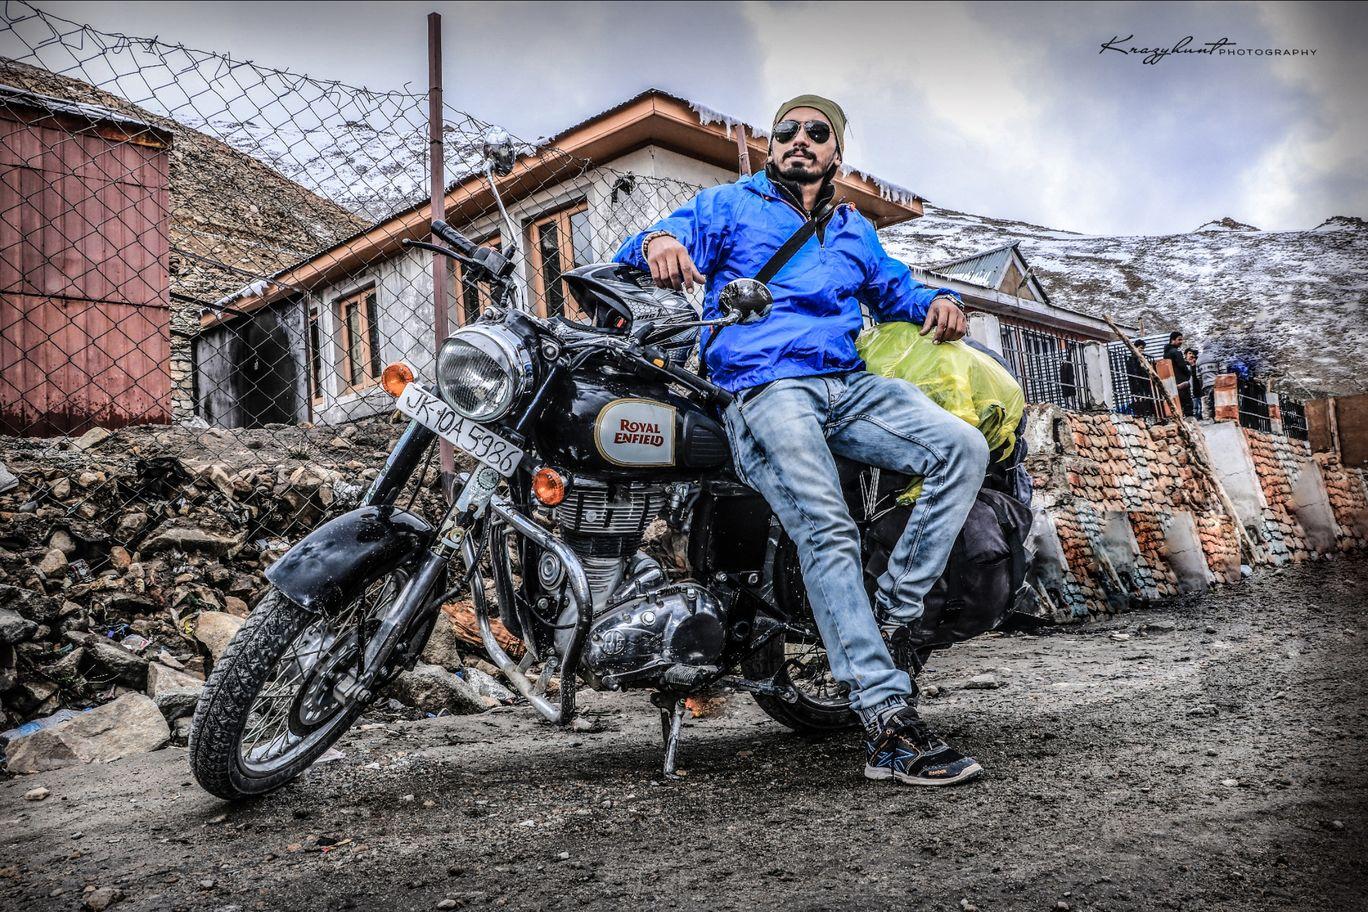 Photo of LEH LADAKH By Vijaybhushan Tripathi